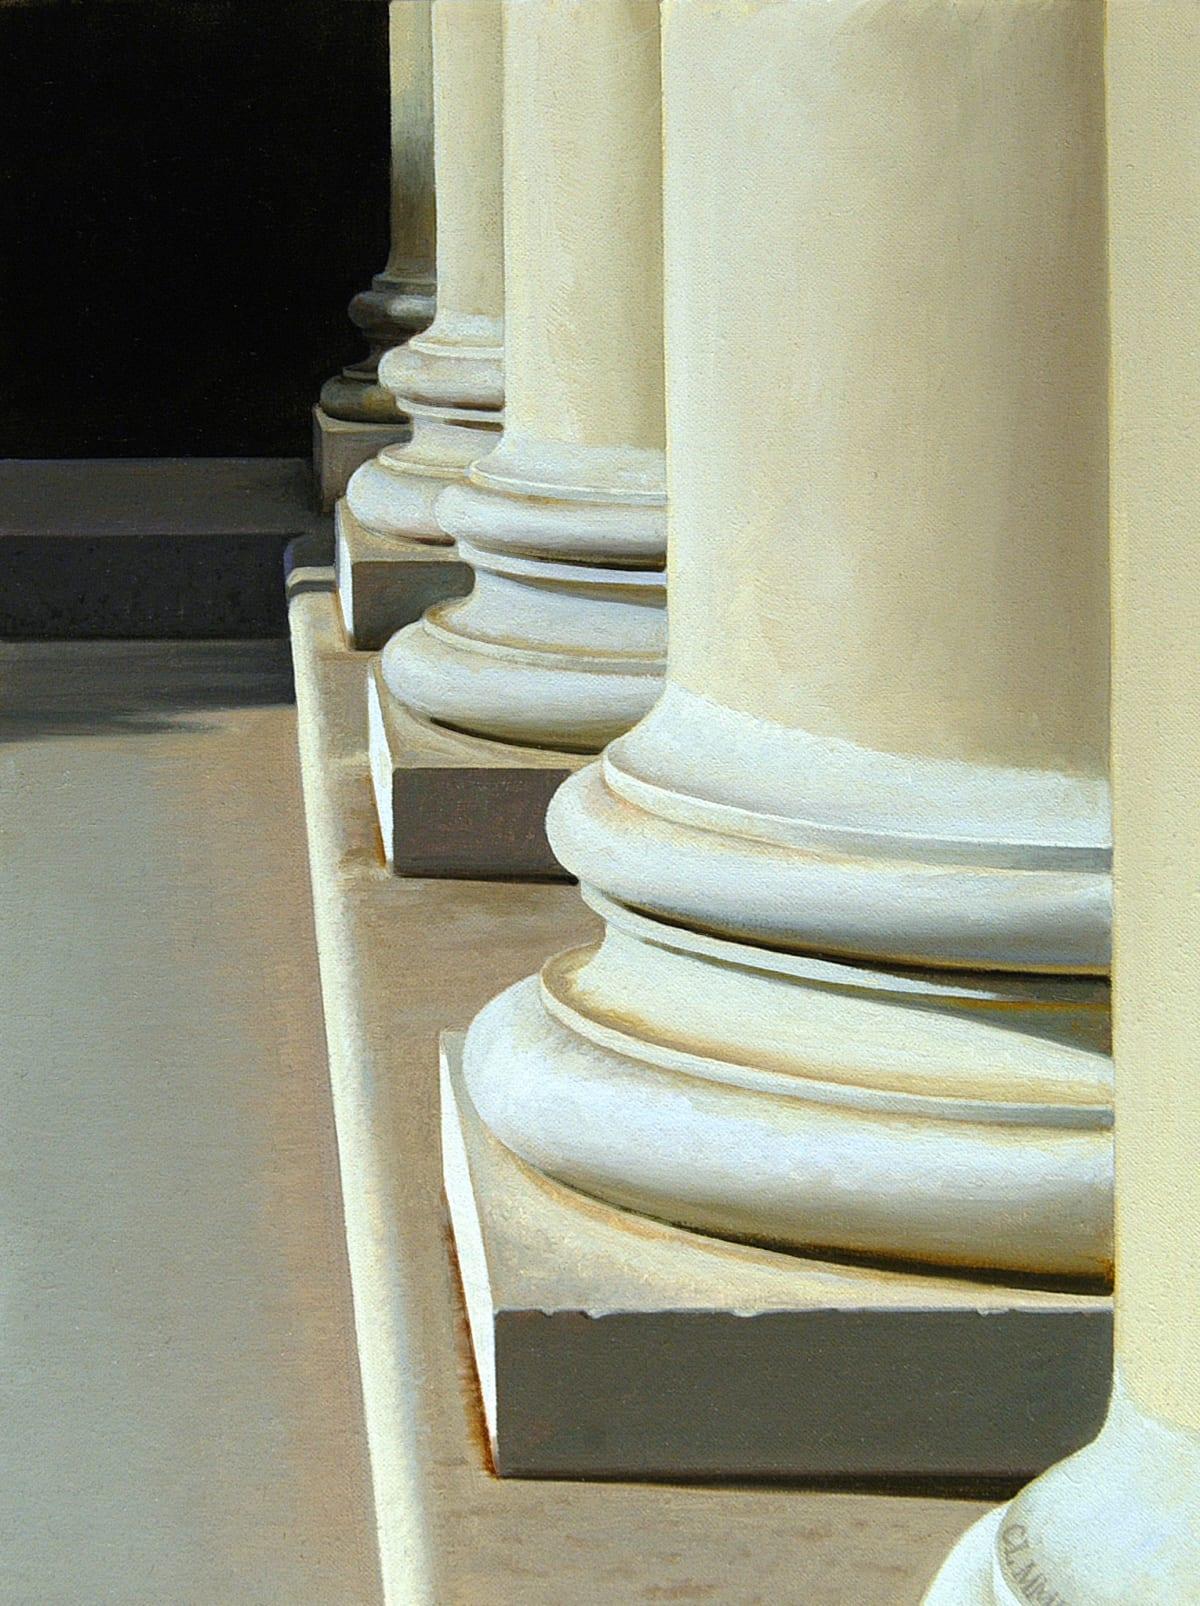 Carl Laubin Villa Rotunda Columns oil on canvas 40 x 30 cm